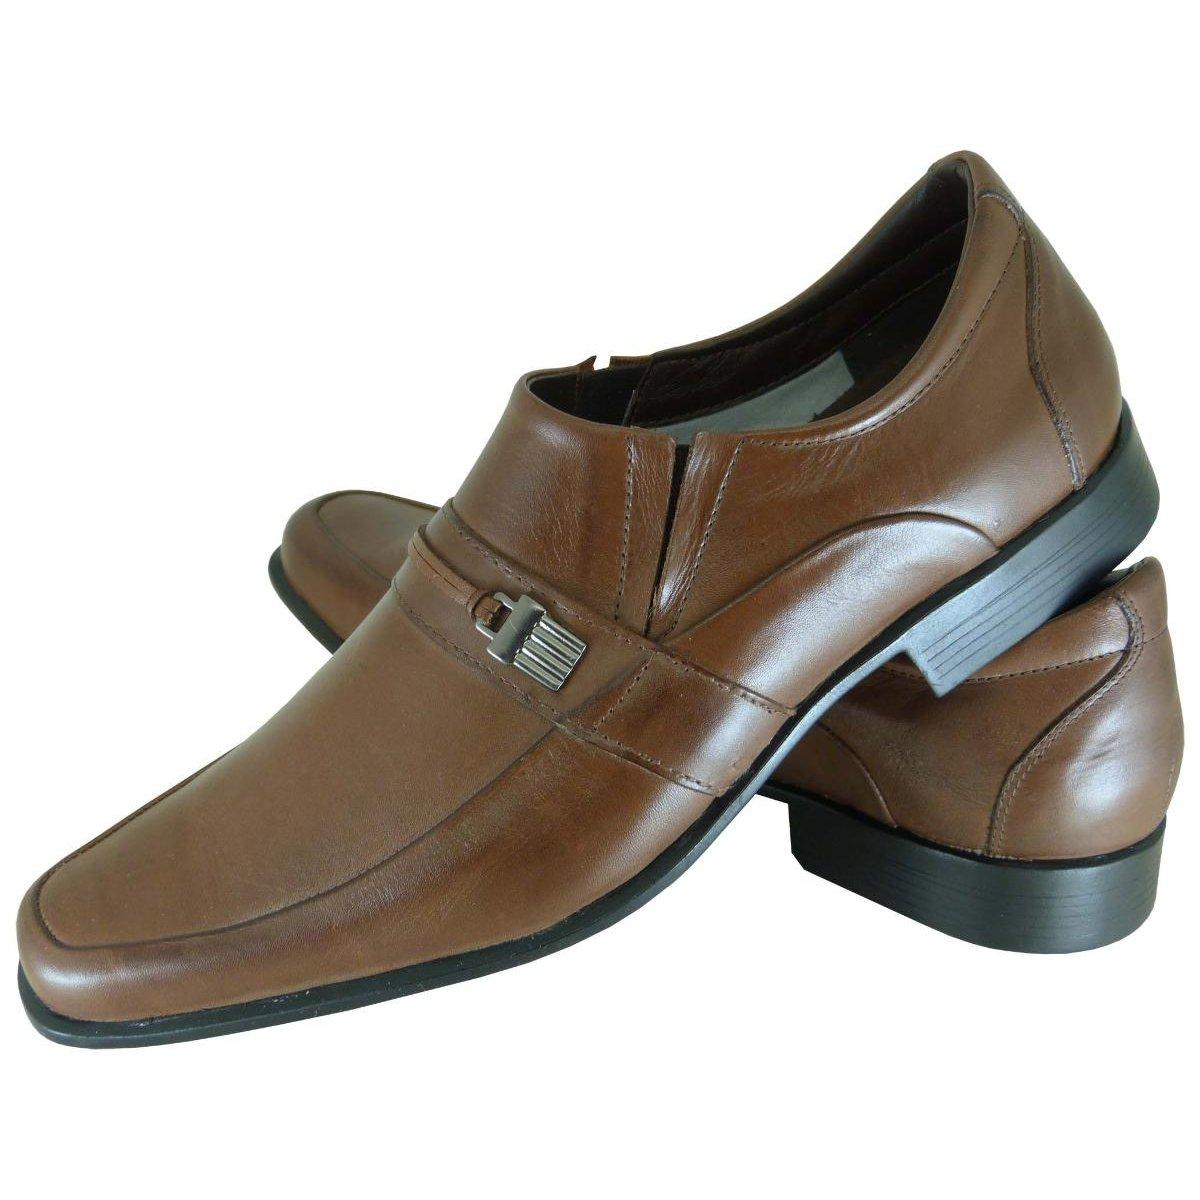 Social Social Cancun Sapato Sapato Stefanello Metal com Marrom com Cancun nIxP1qxg